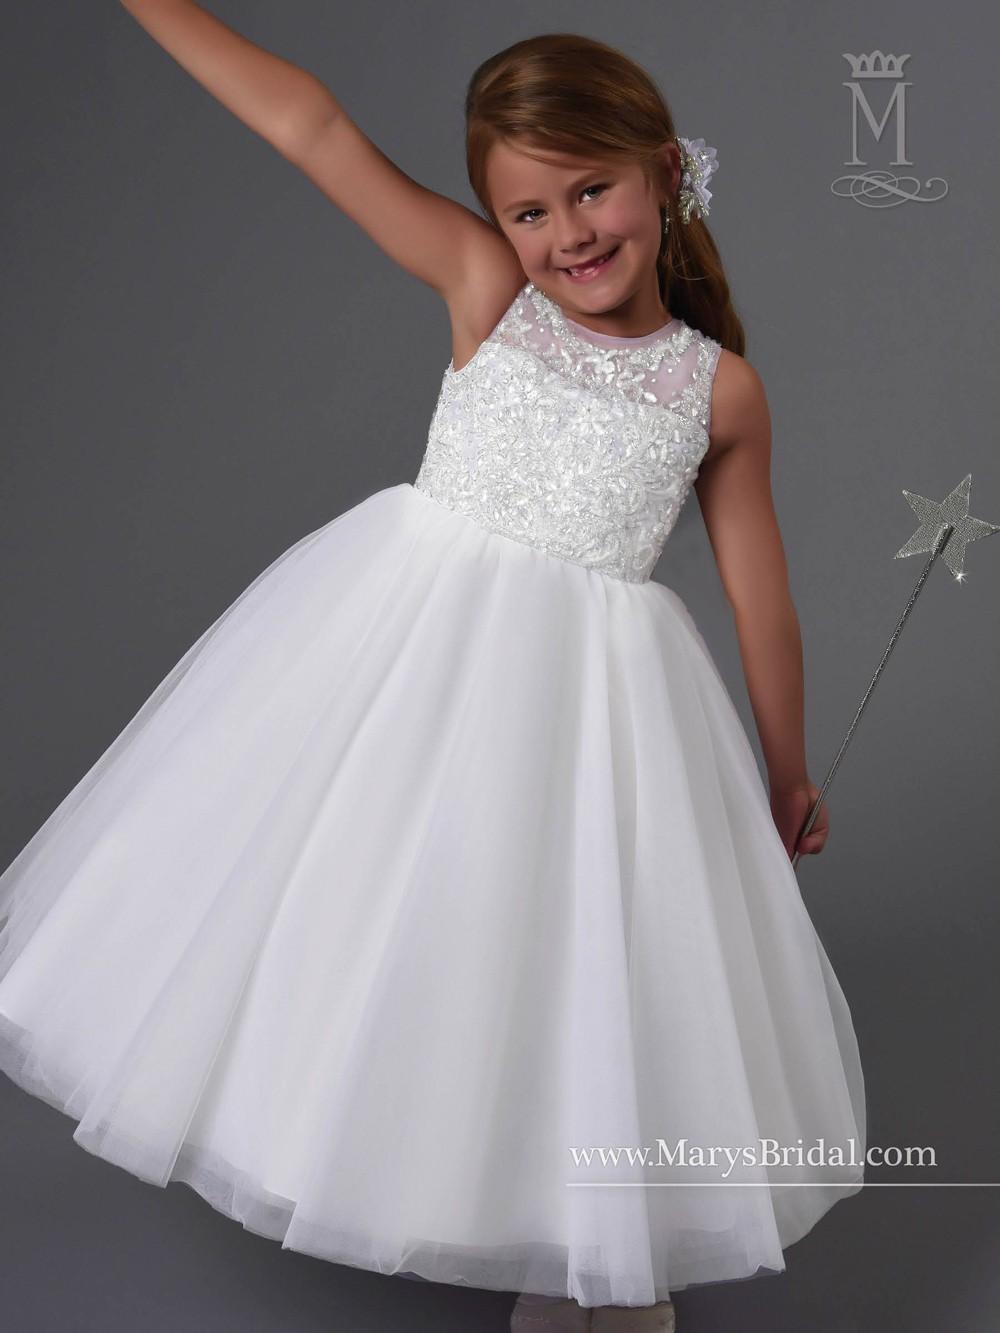 wedding dresses for baby girls photo - 1